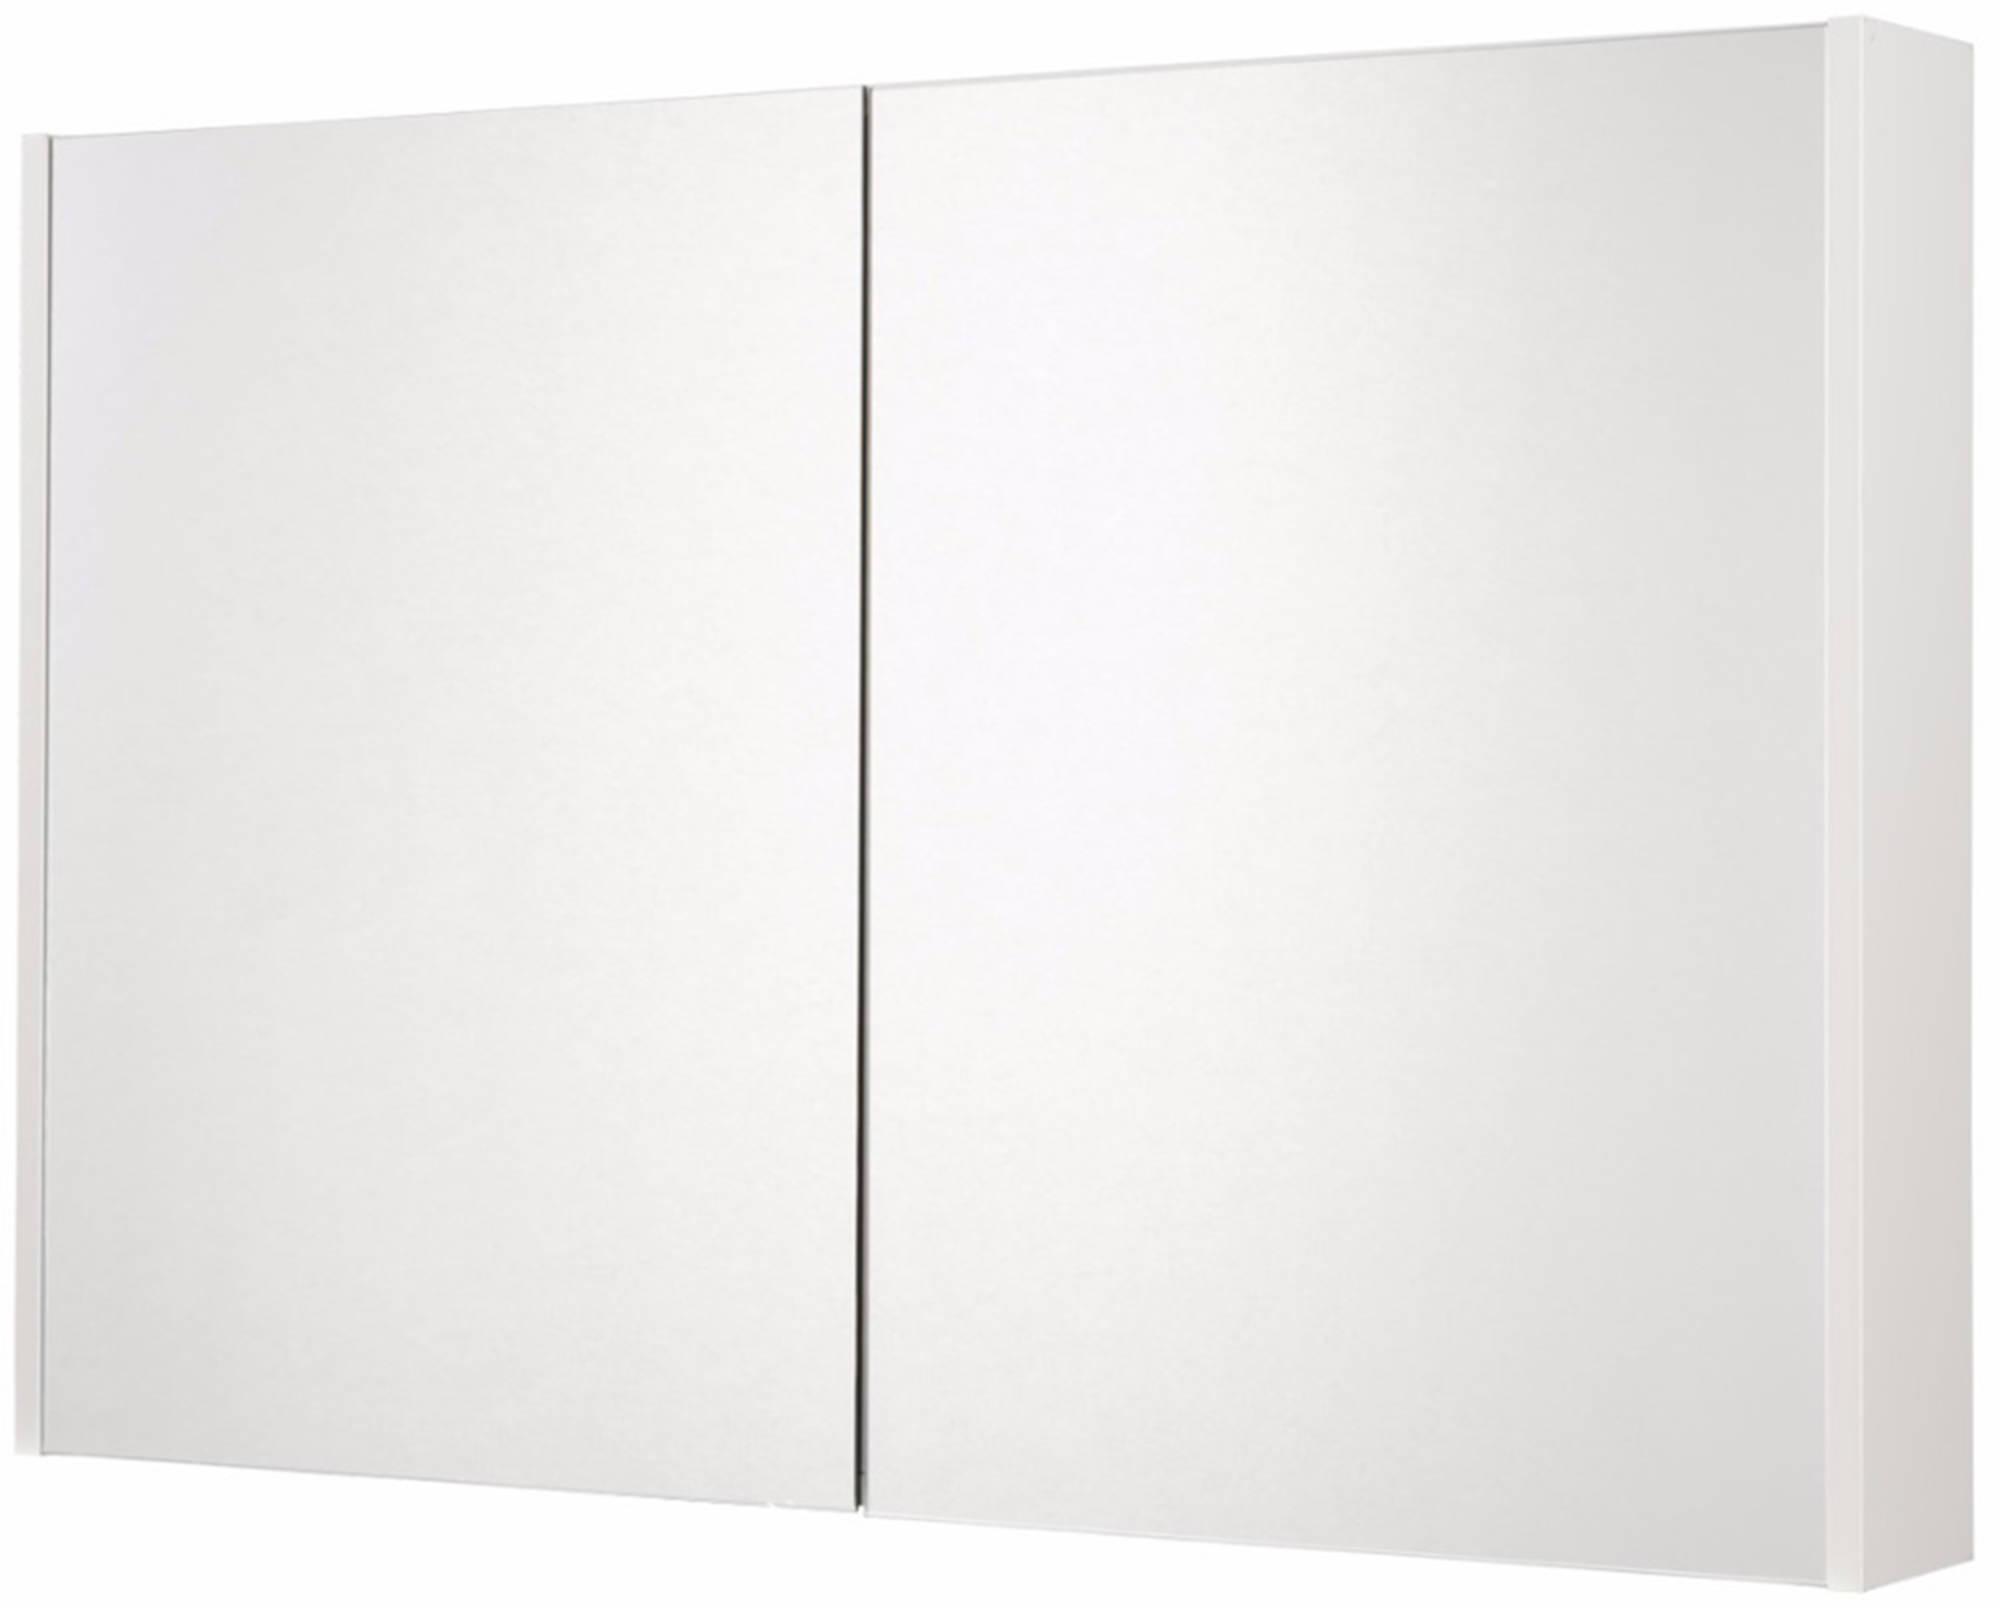 Saniselect Socan Spiegelkast 100x14x70 cm Glanzend Wit